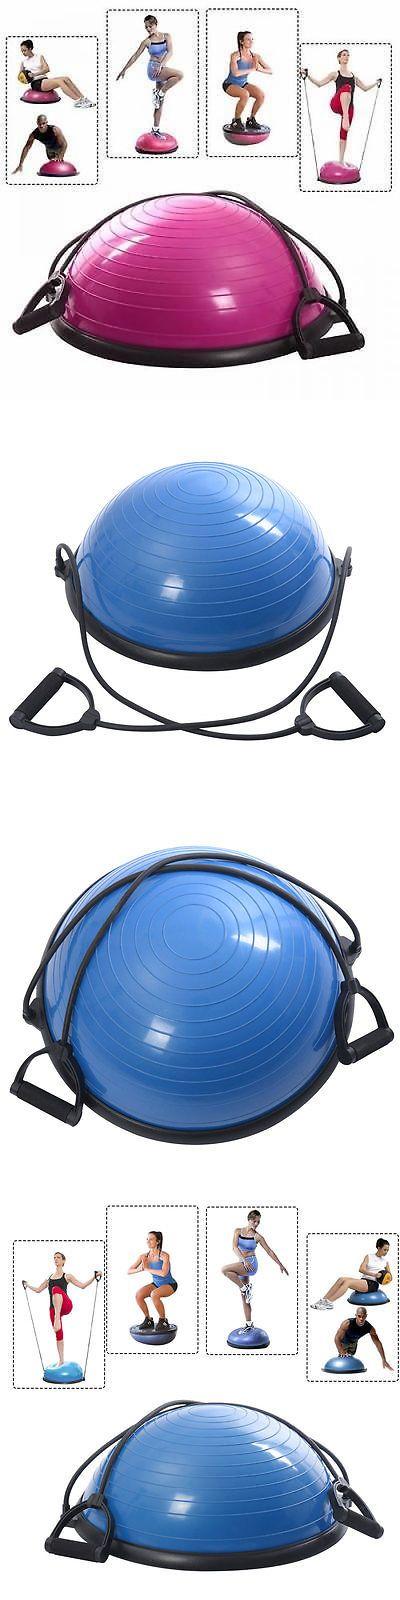 Balance Trainers 179803: Bosu Balance Ball Trainer Strength Training Equipment Yoga Endurance Workout -> BUY IT NOW ONLY: $64.99 on eBay!